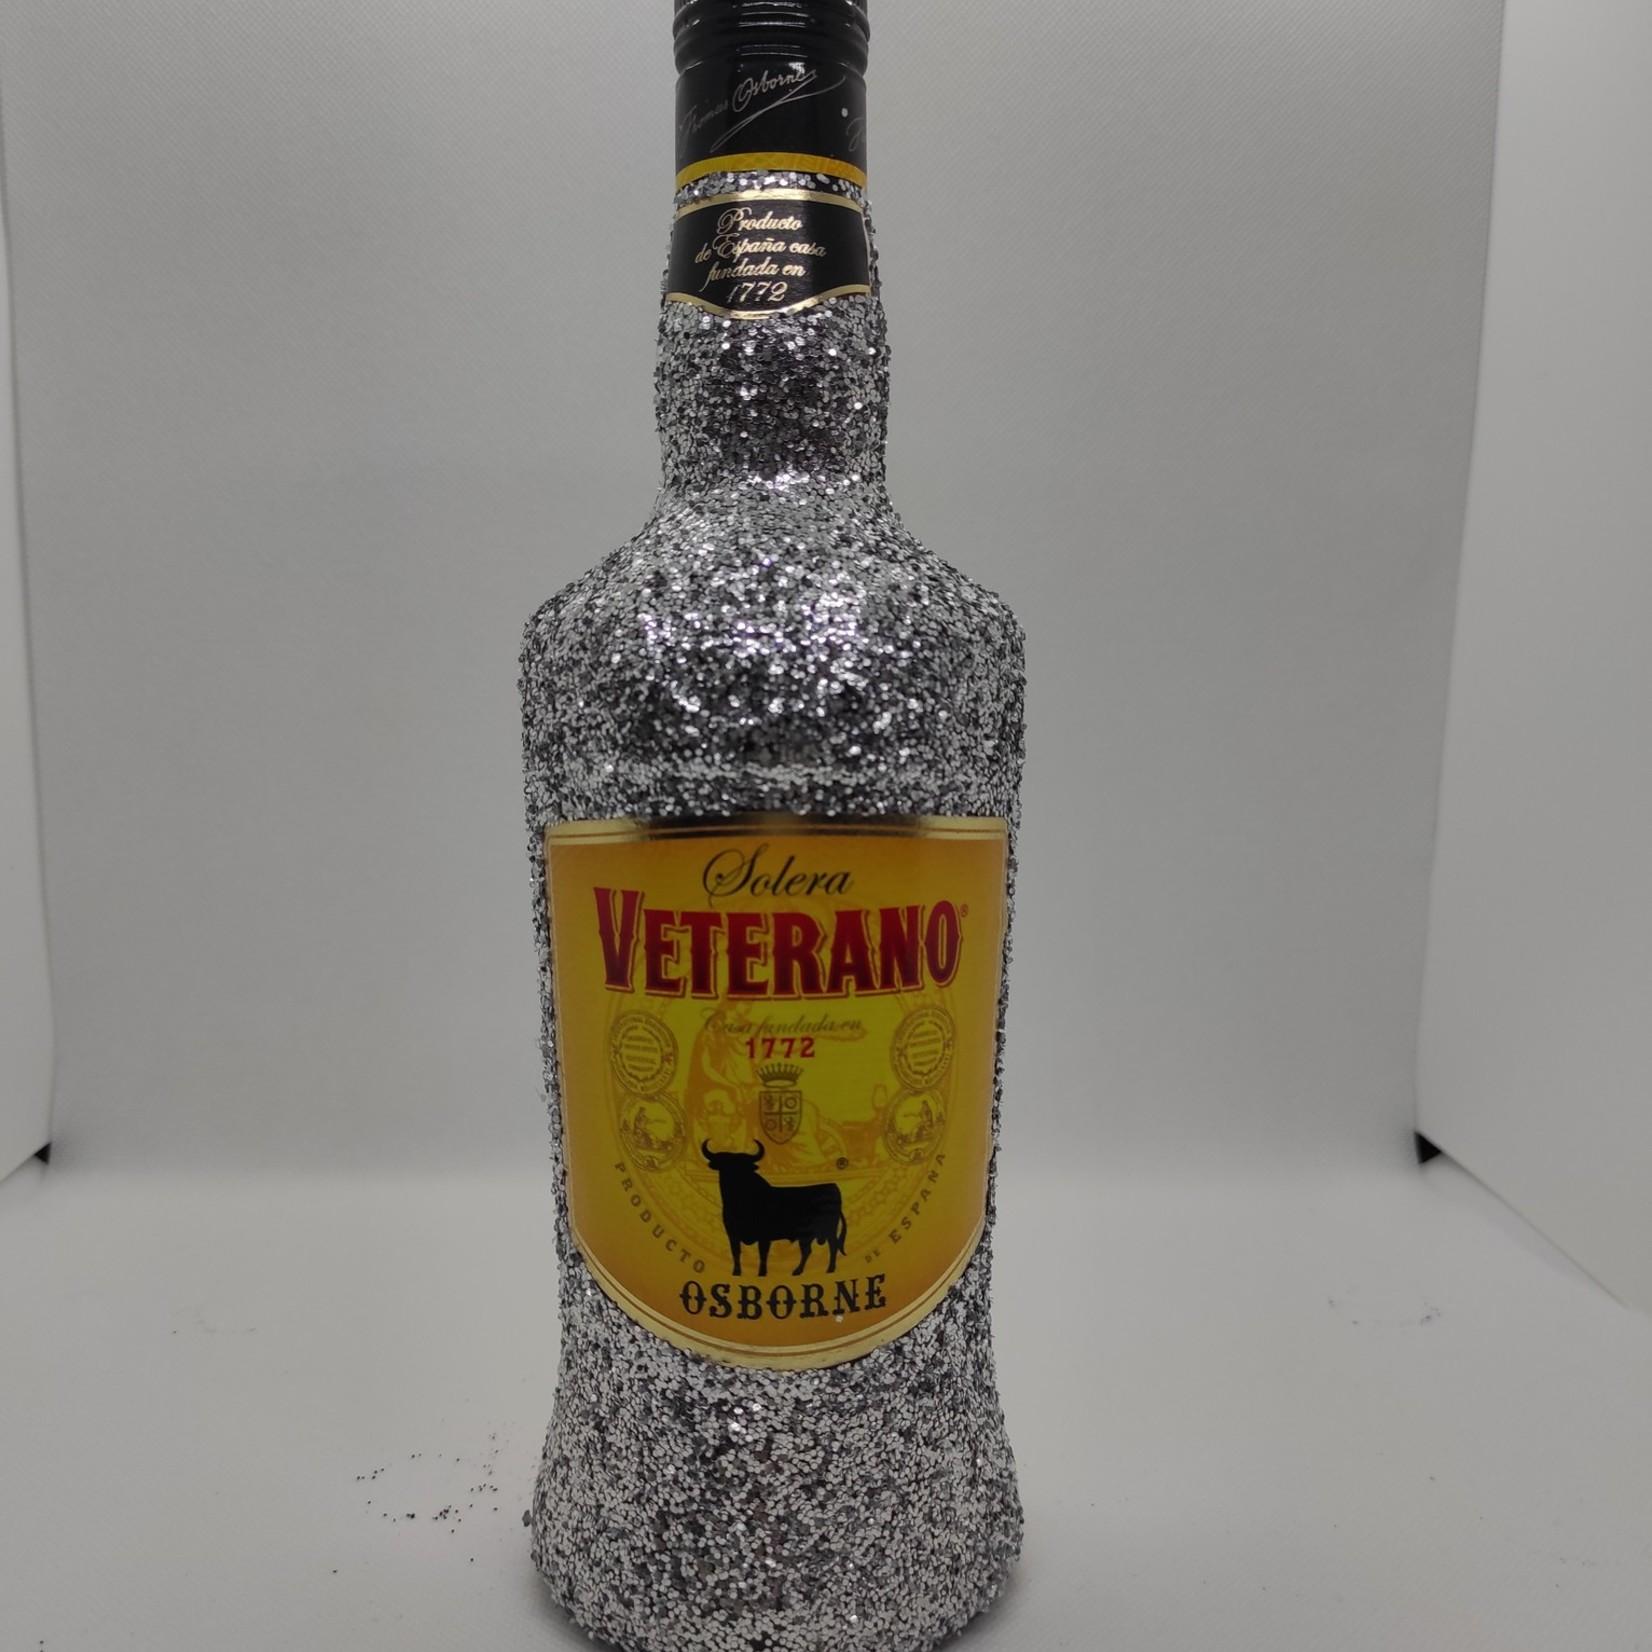 Cognac & Brandy Osborne Veterano 1,0 Liter